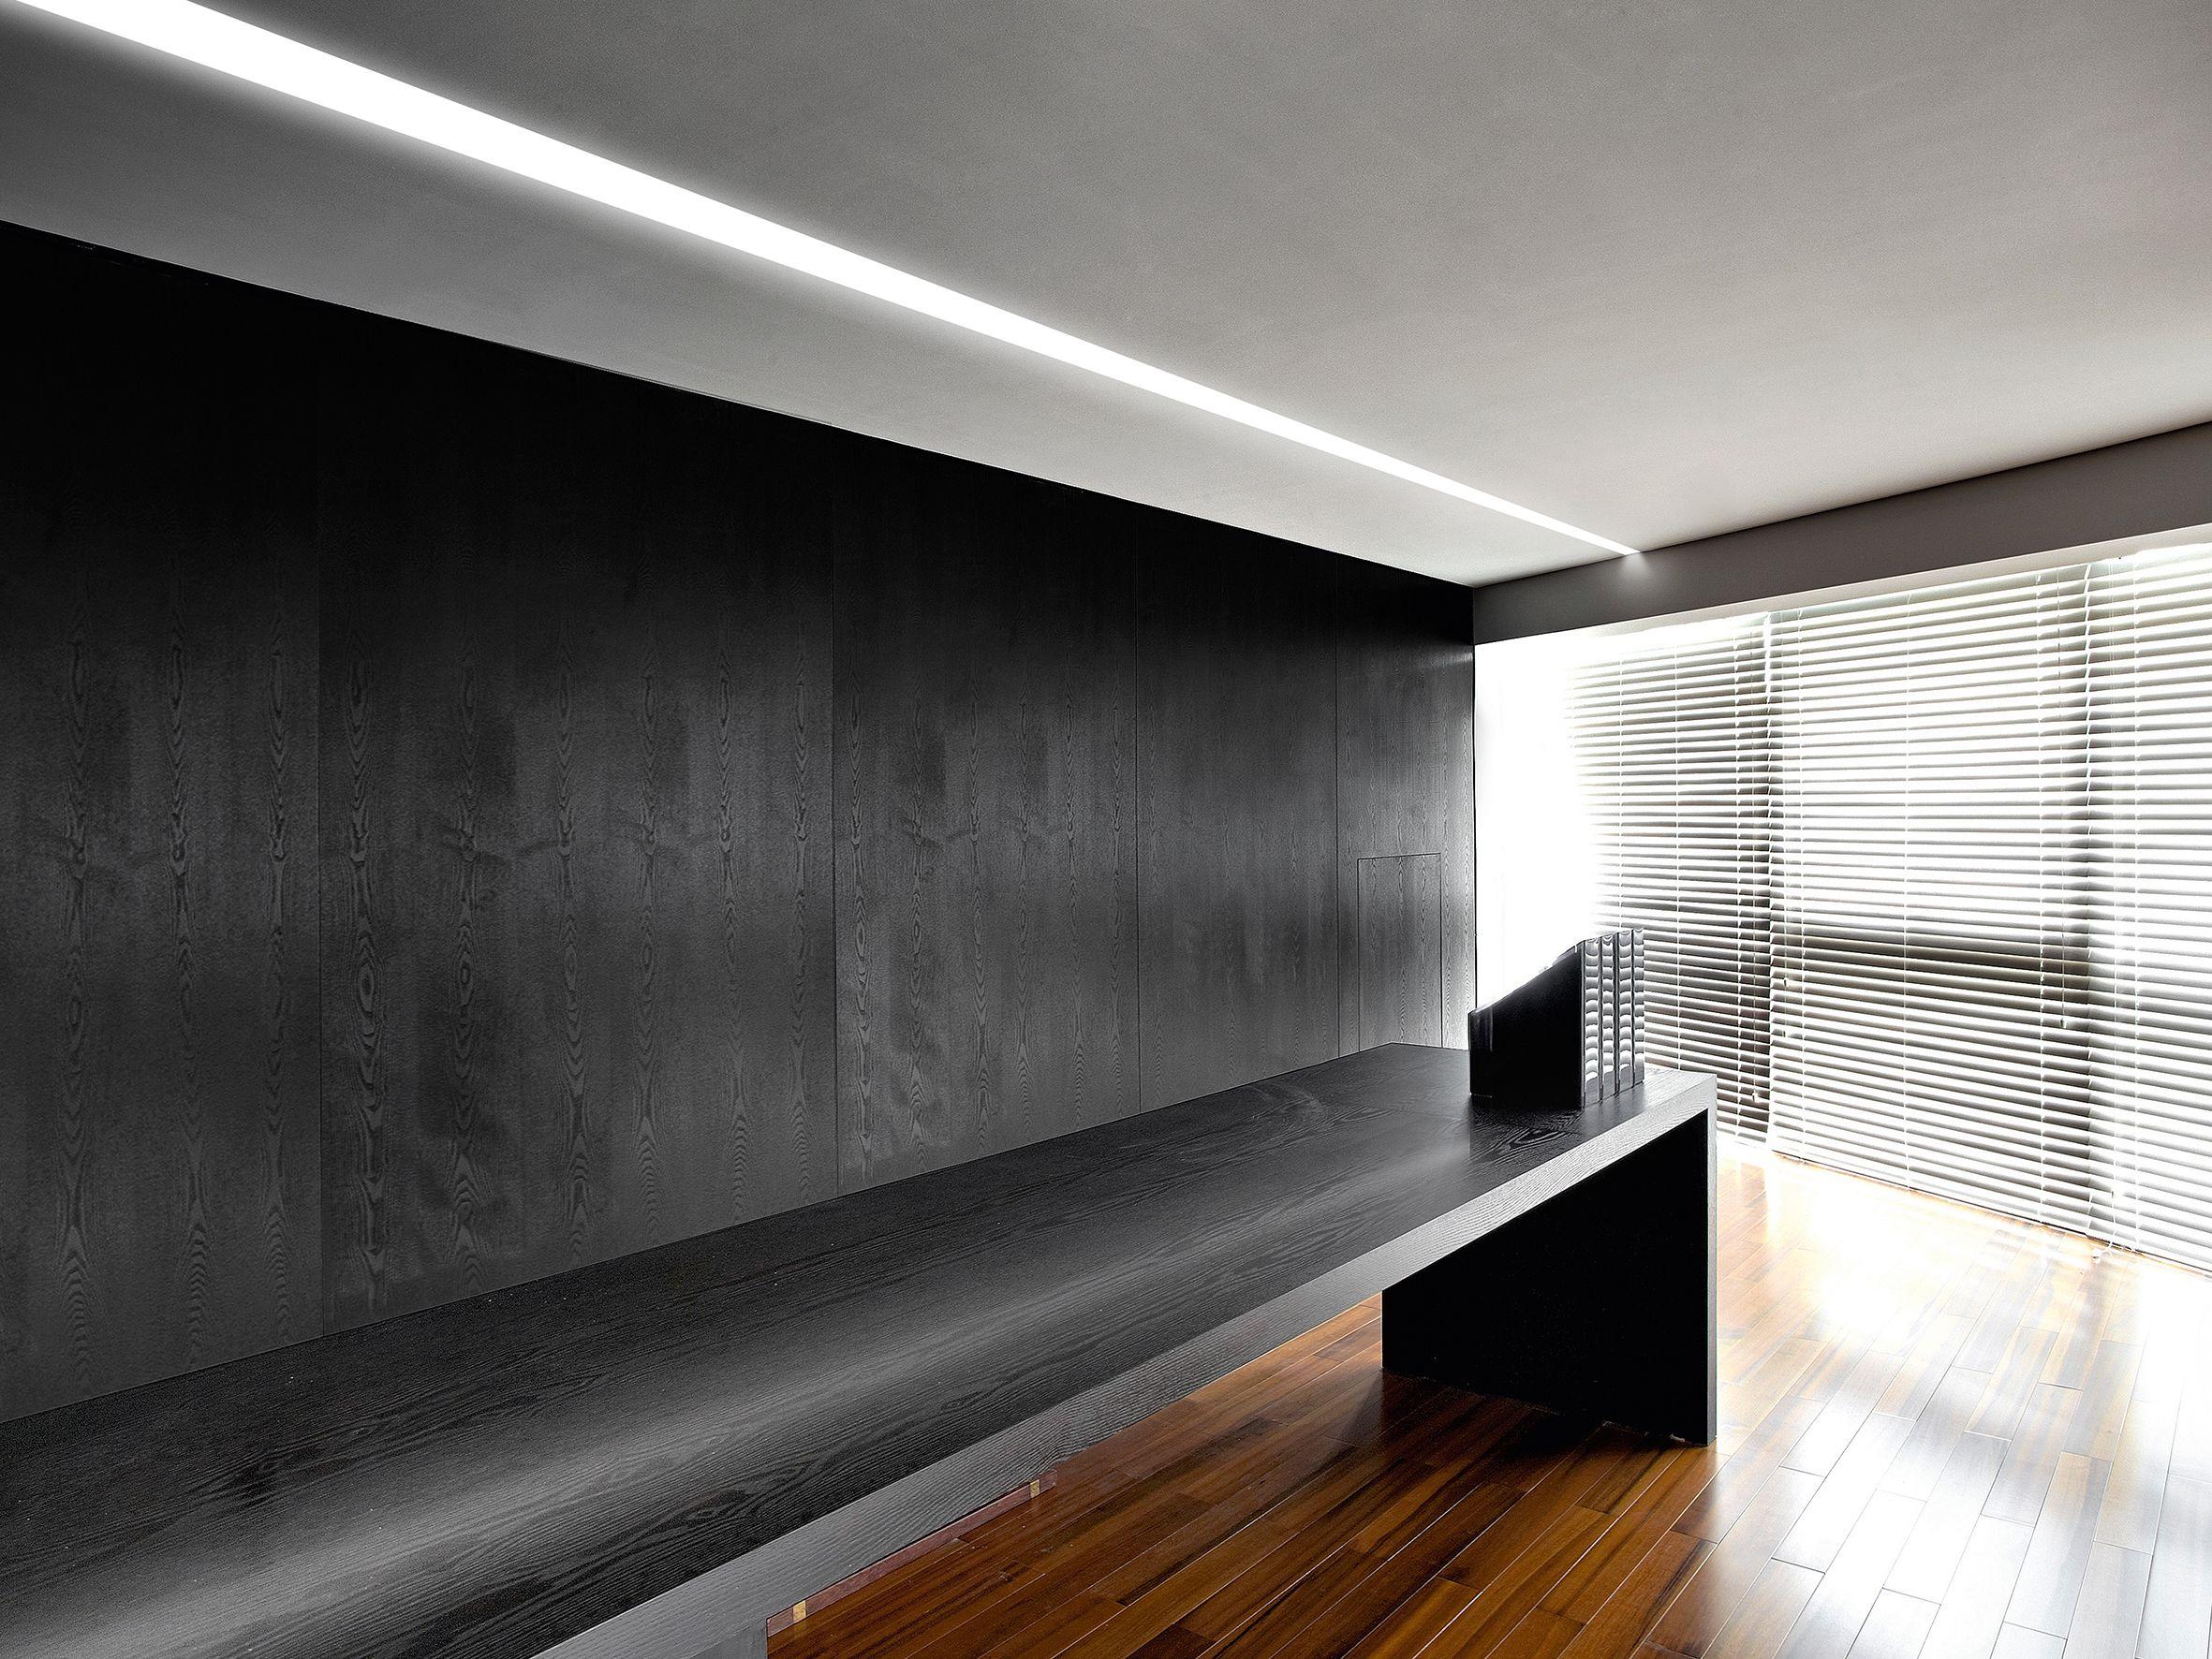 Ovvio Tavoli Da Giardino.Minimalism Modularity And Ease Of Installation Characterize Ovvio